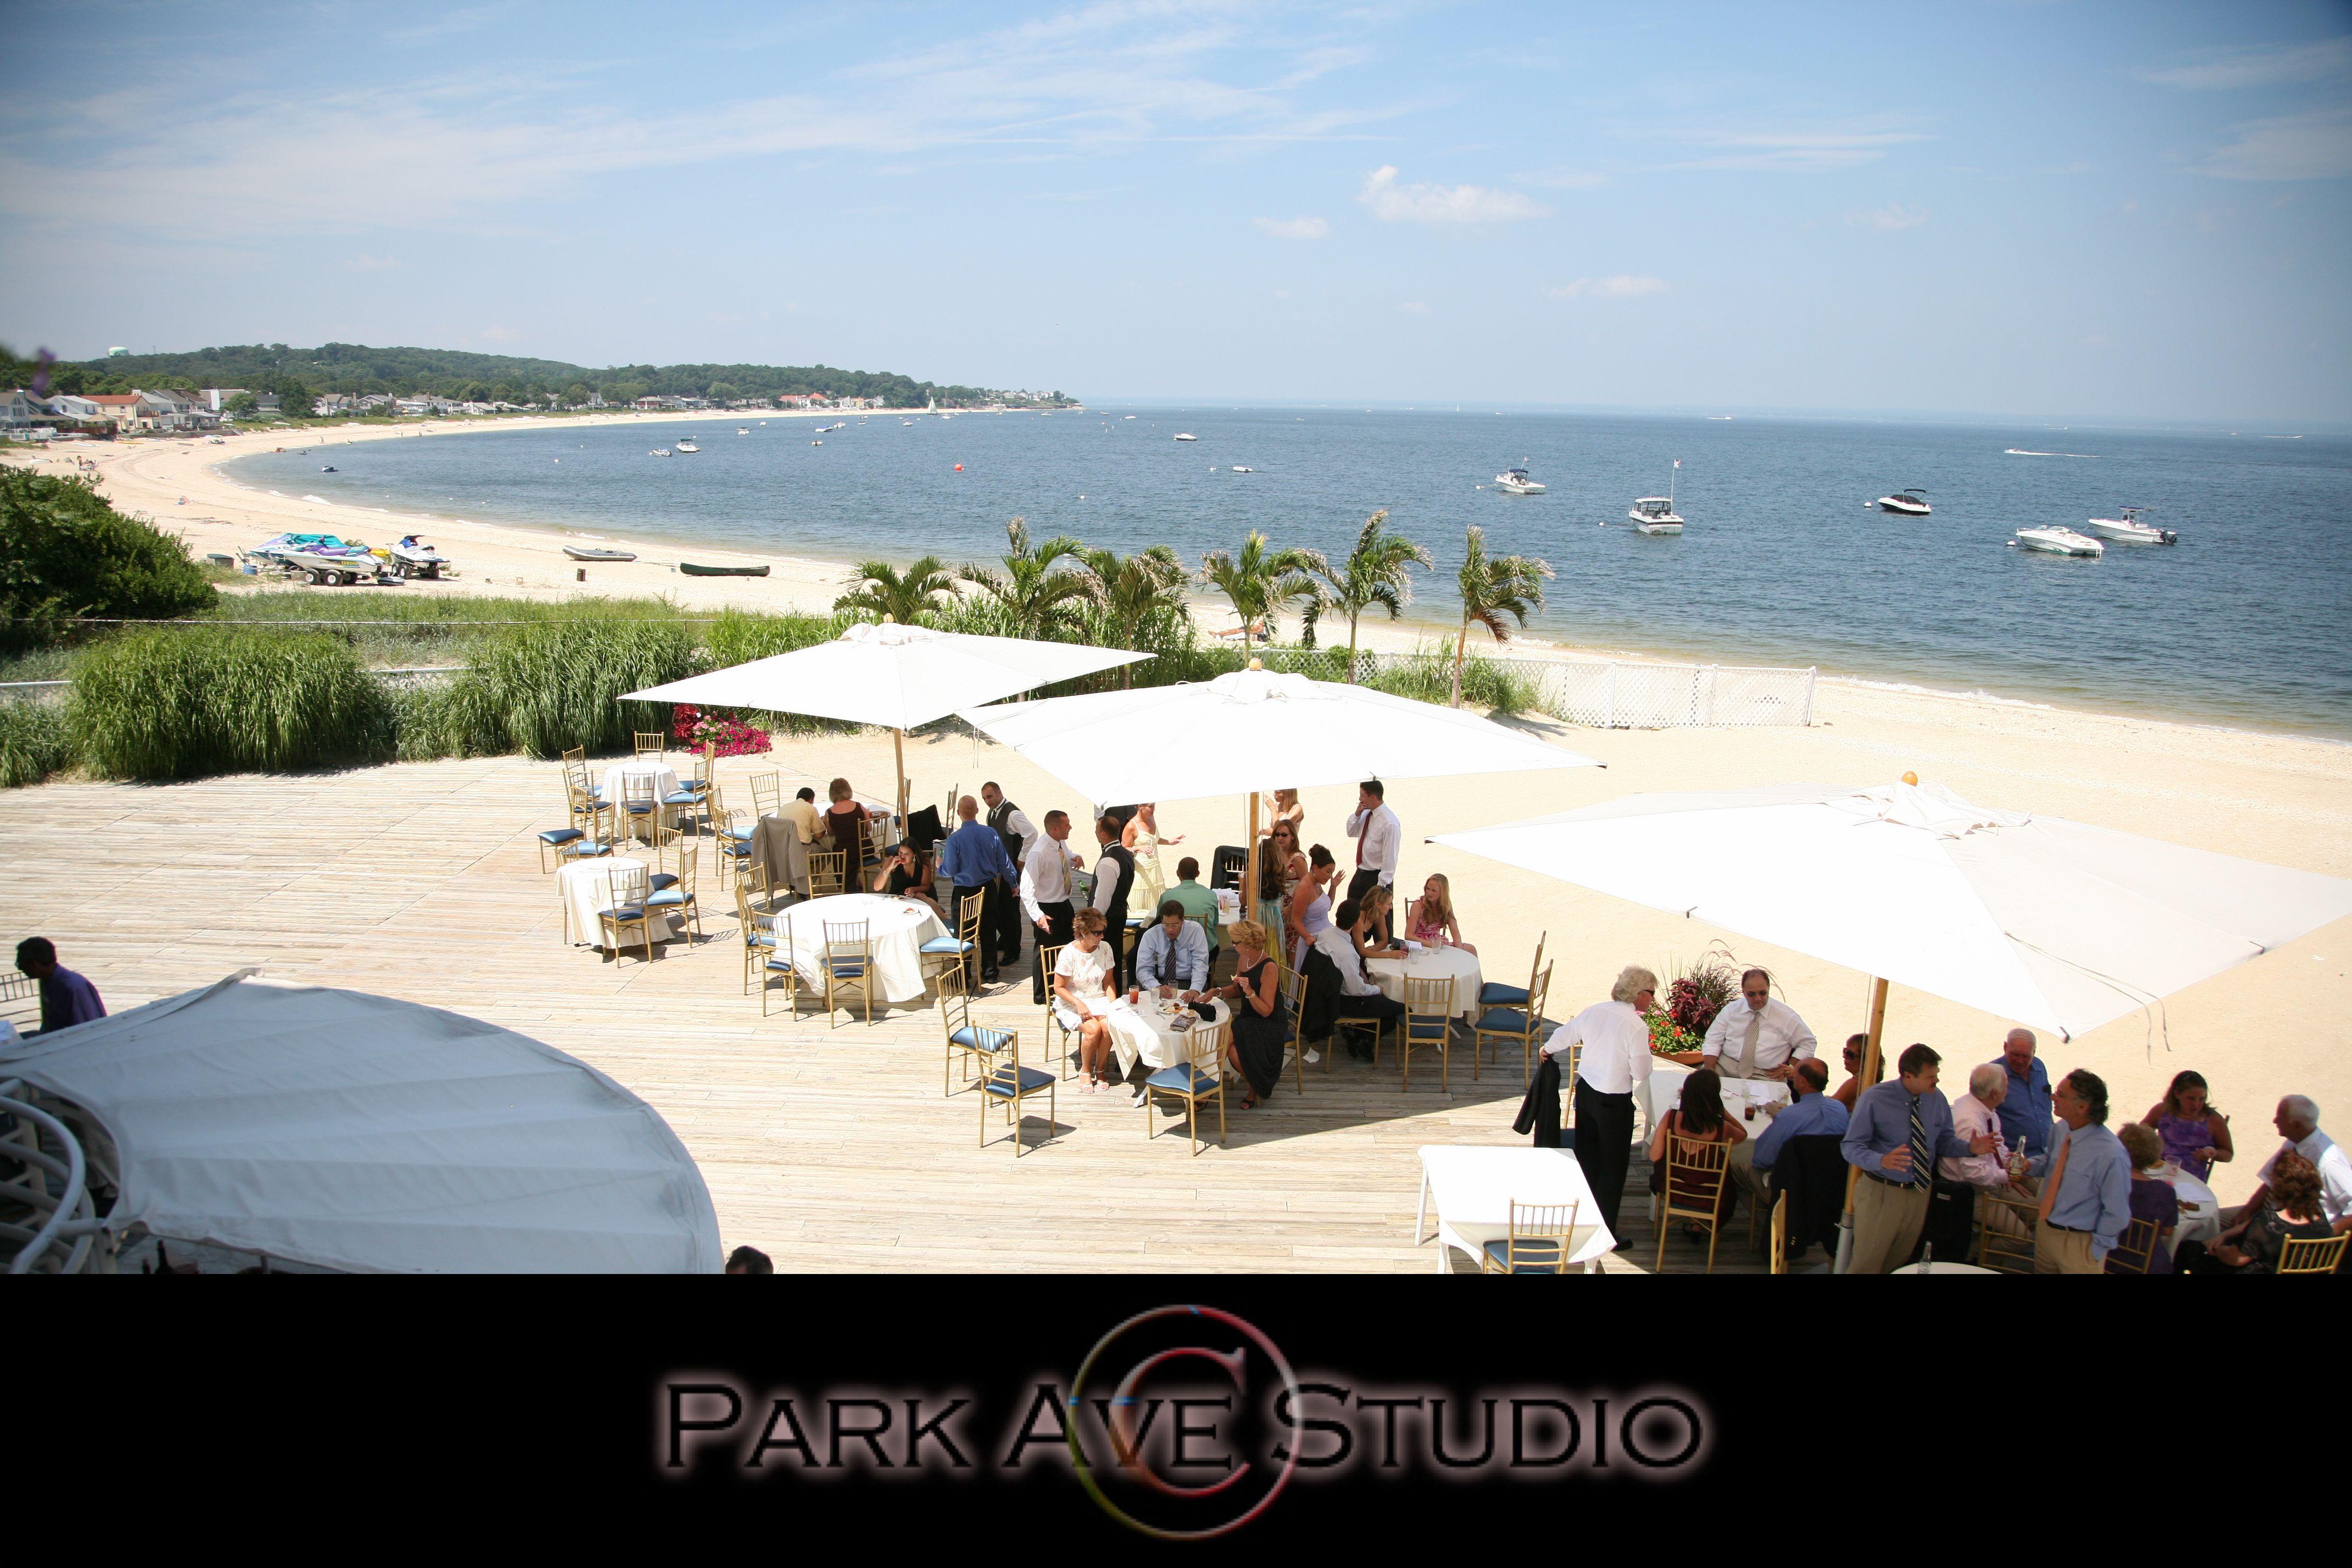 Park Ave Studio Photography